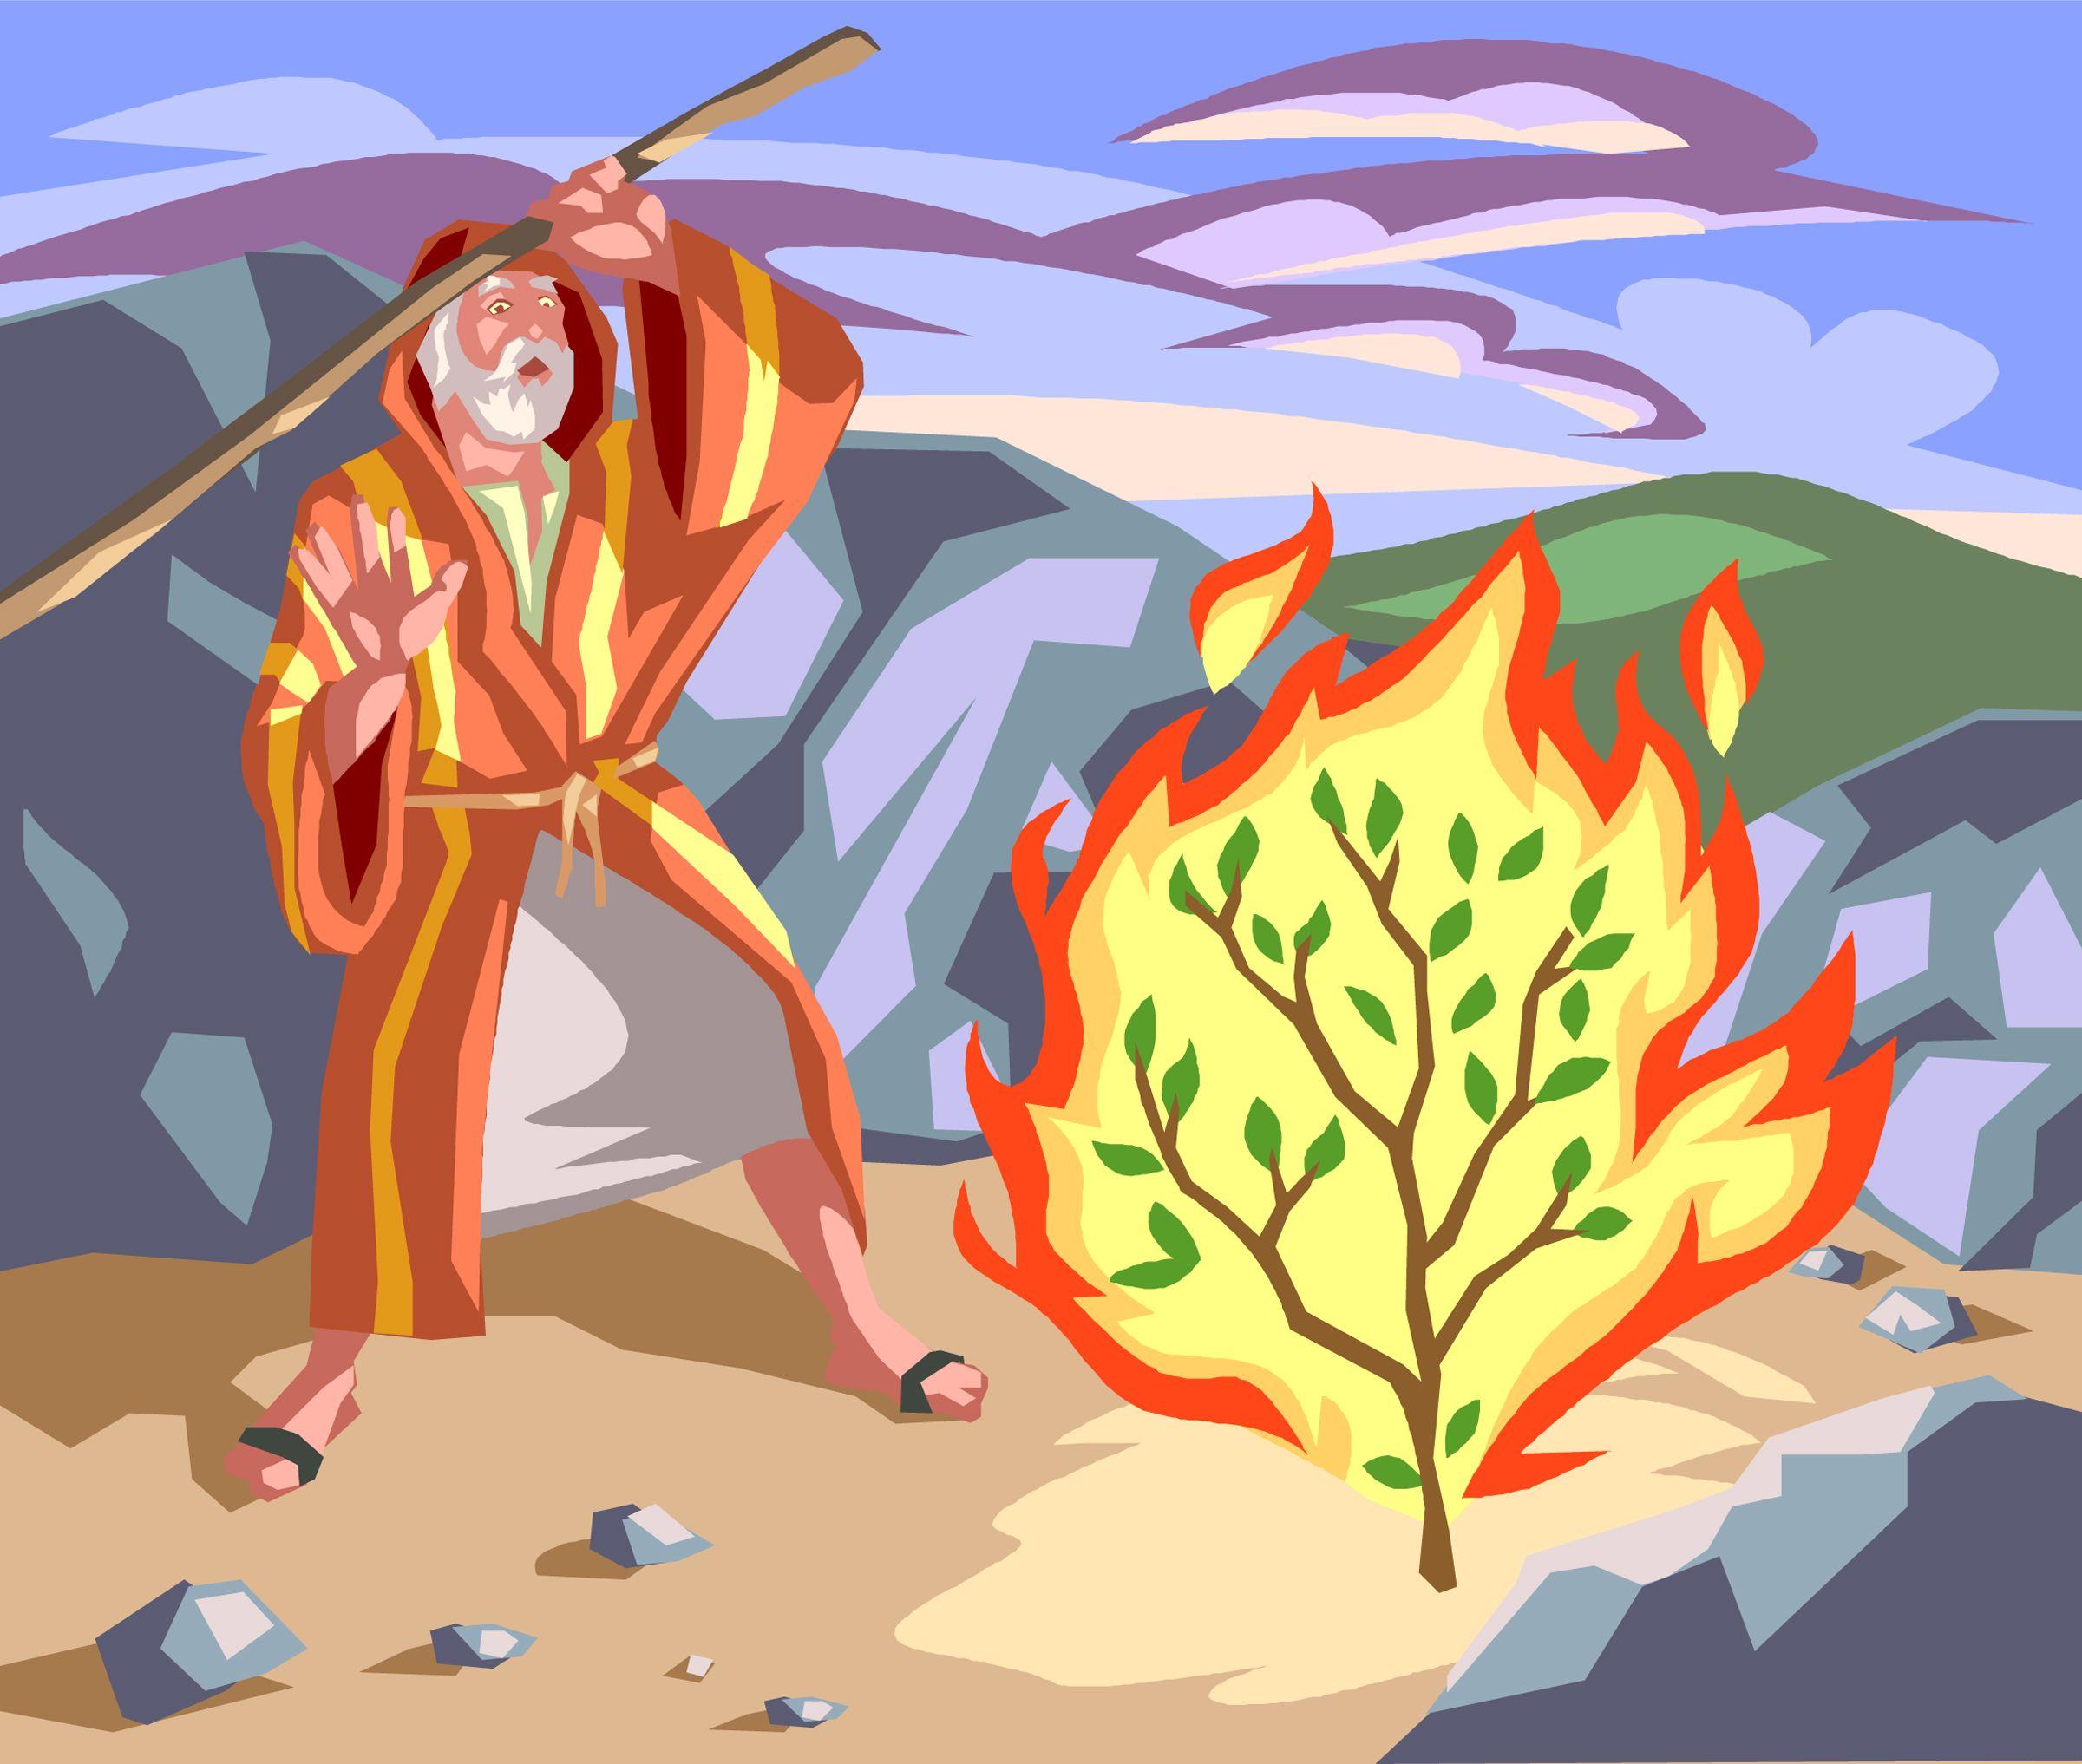 Moses clipart burning bush, Moses burning bush Transparent.